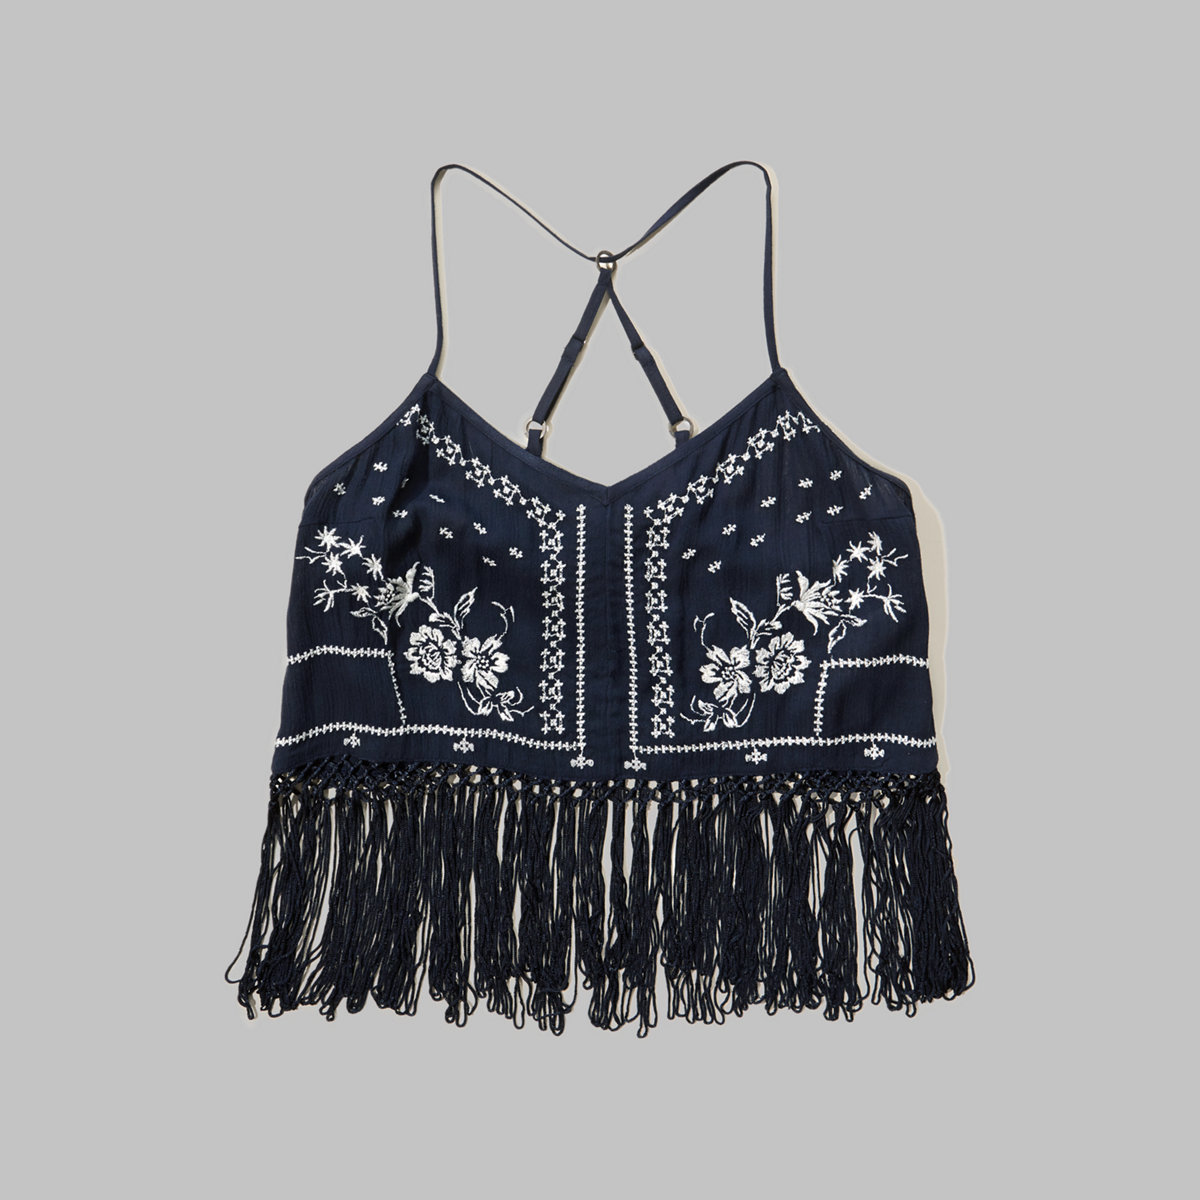 Embroidered Fringe Crop Top